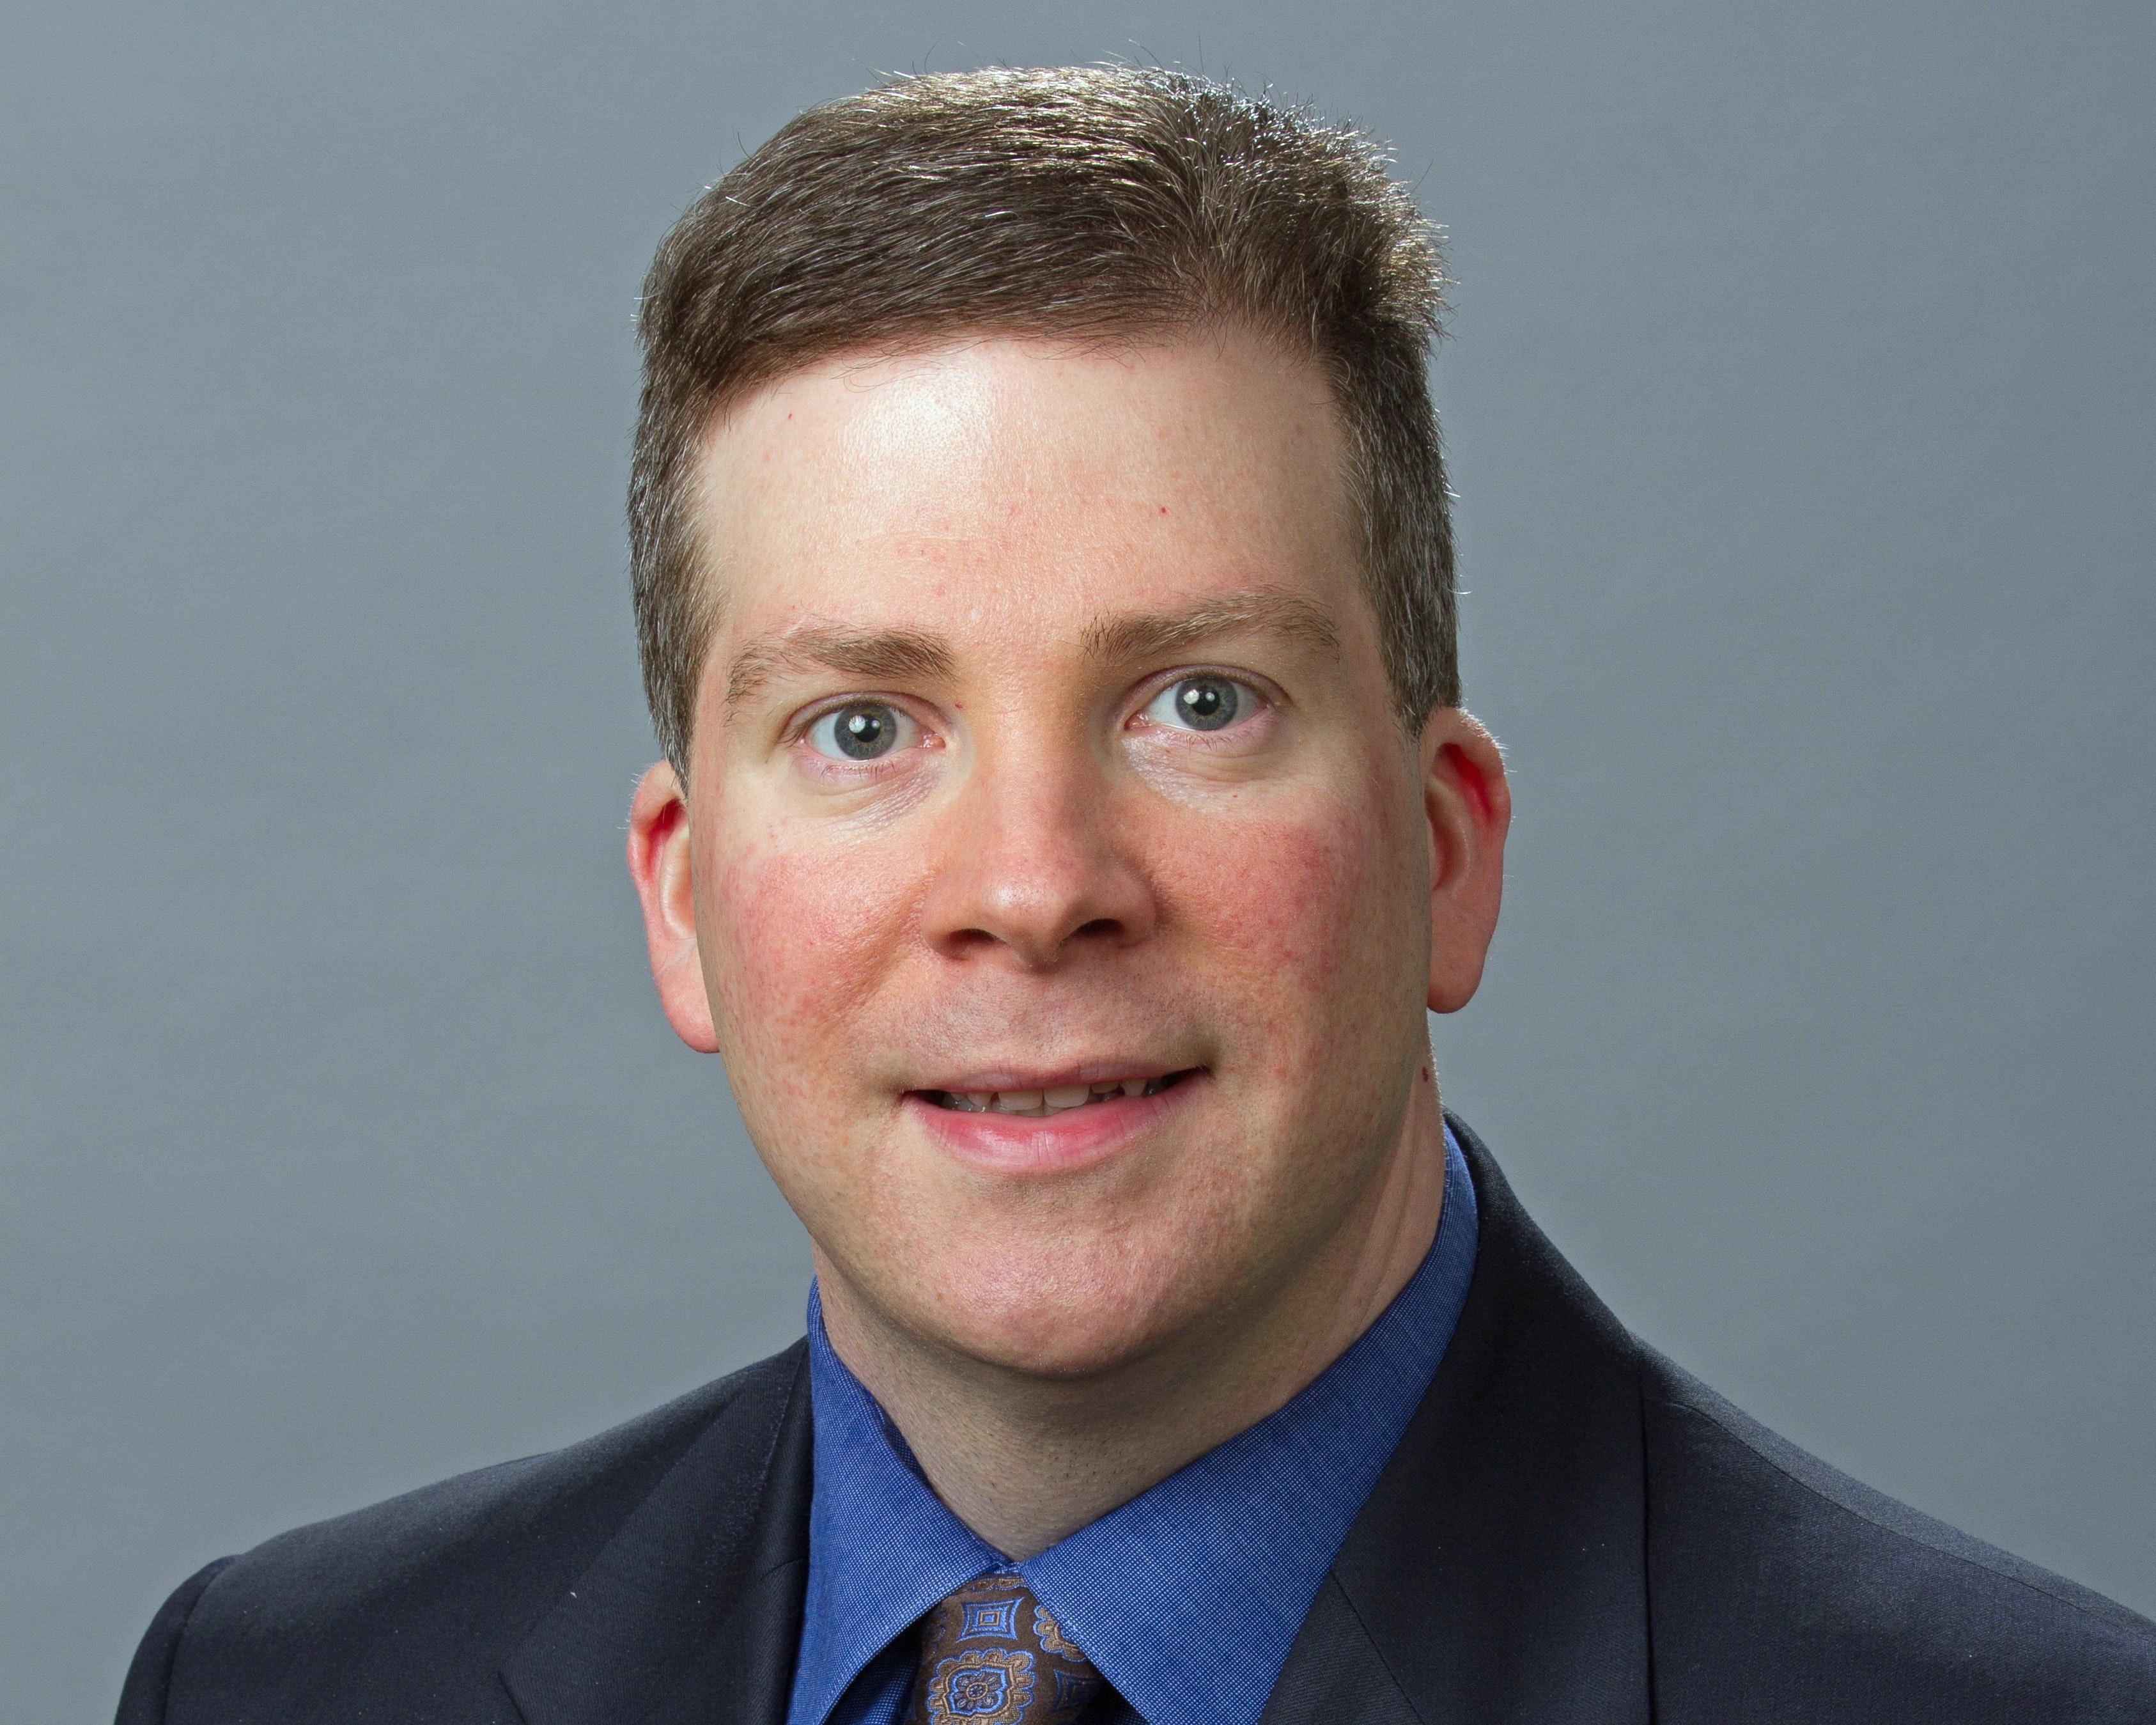 Dr. Eric Stoopler